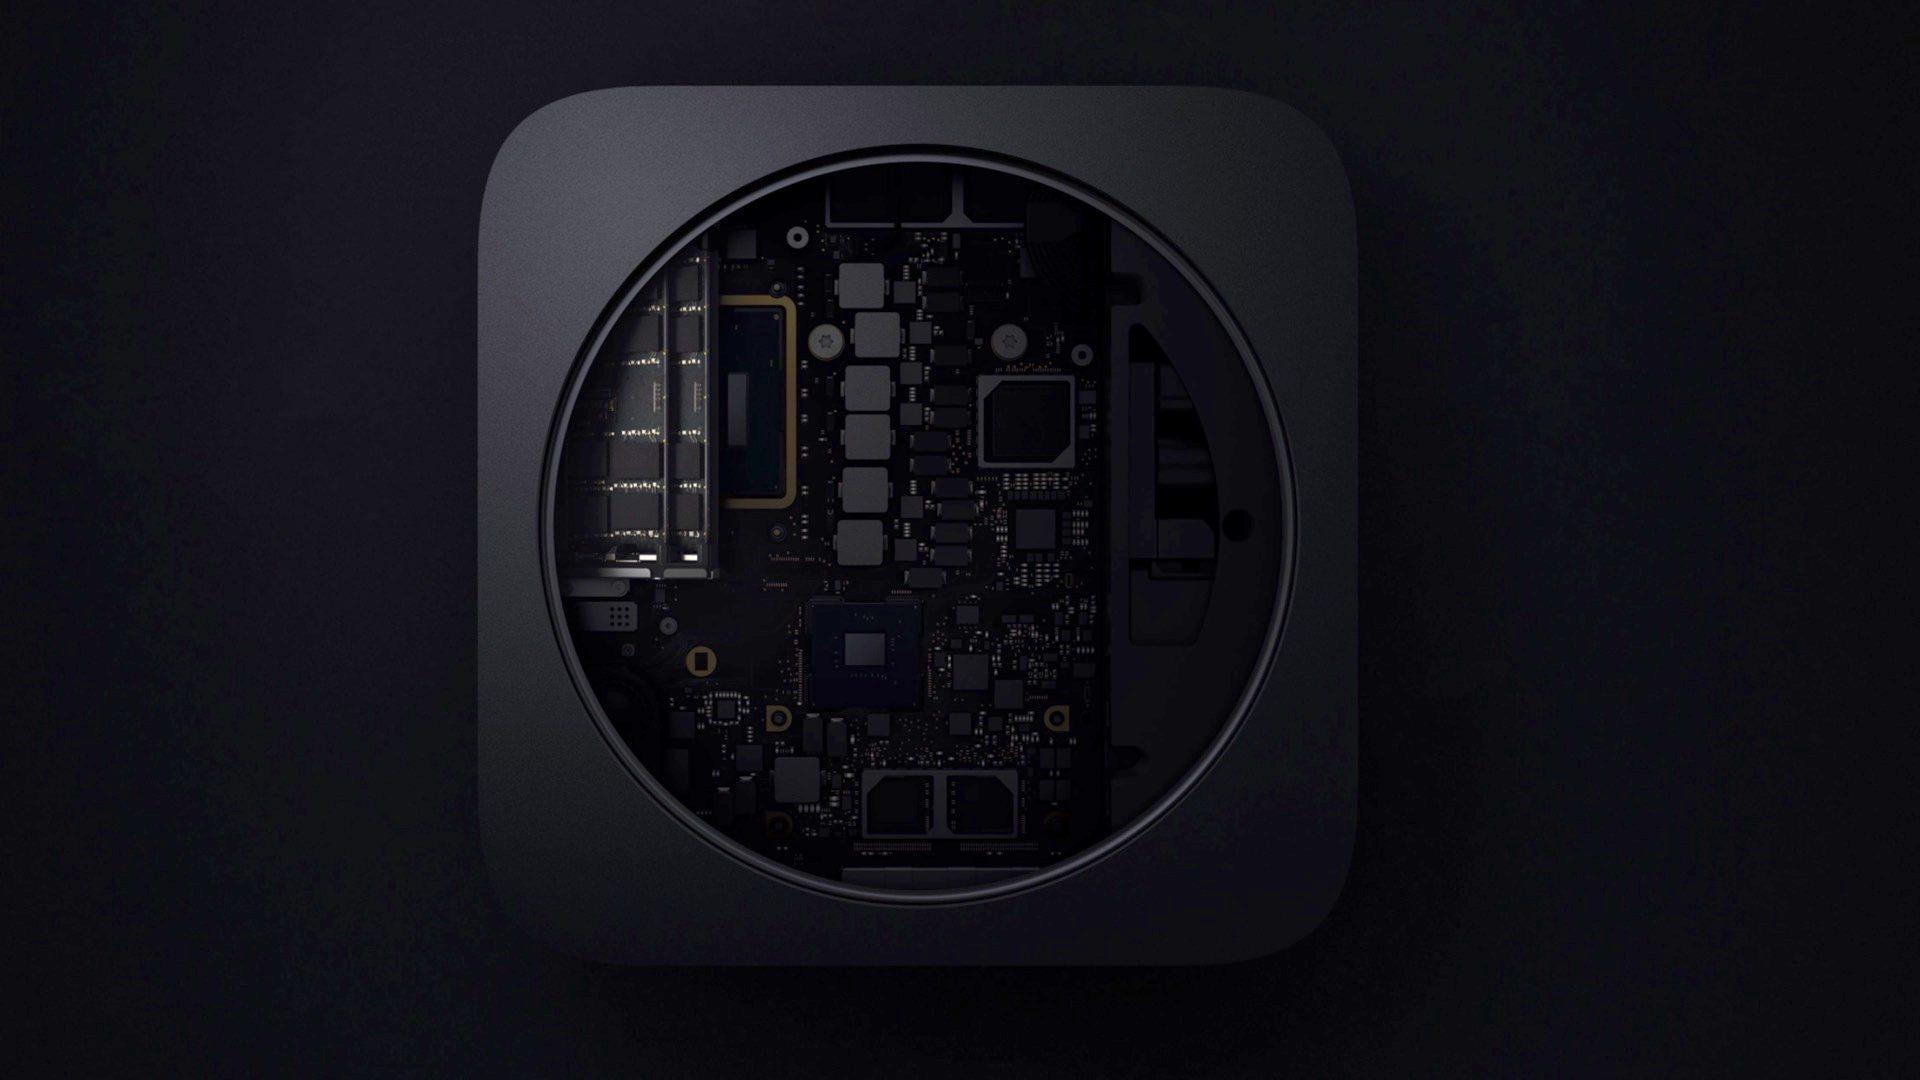 "<span href=""https://9to5mac.com/2018/11/10/review-2018-mac-mini-video/"">Reseña: 2018 Mac mini de Apple más versátil Mac [Video]</a>"